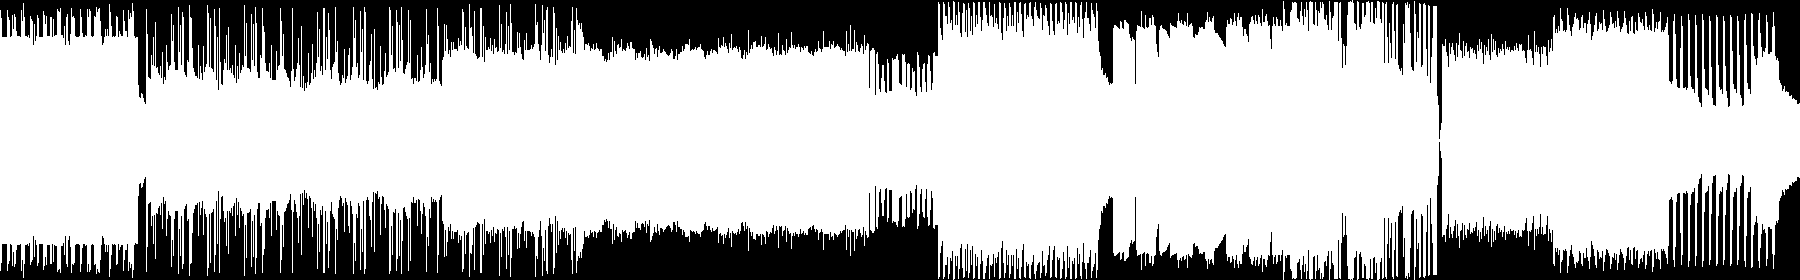 Astro Vision audio waveform